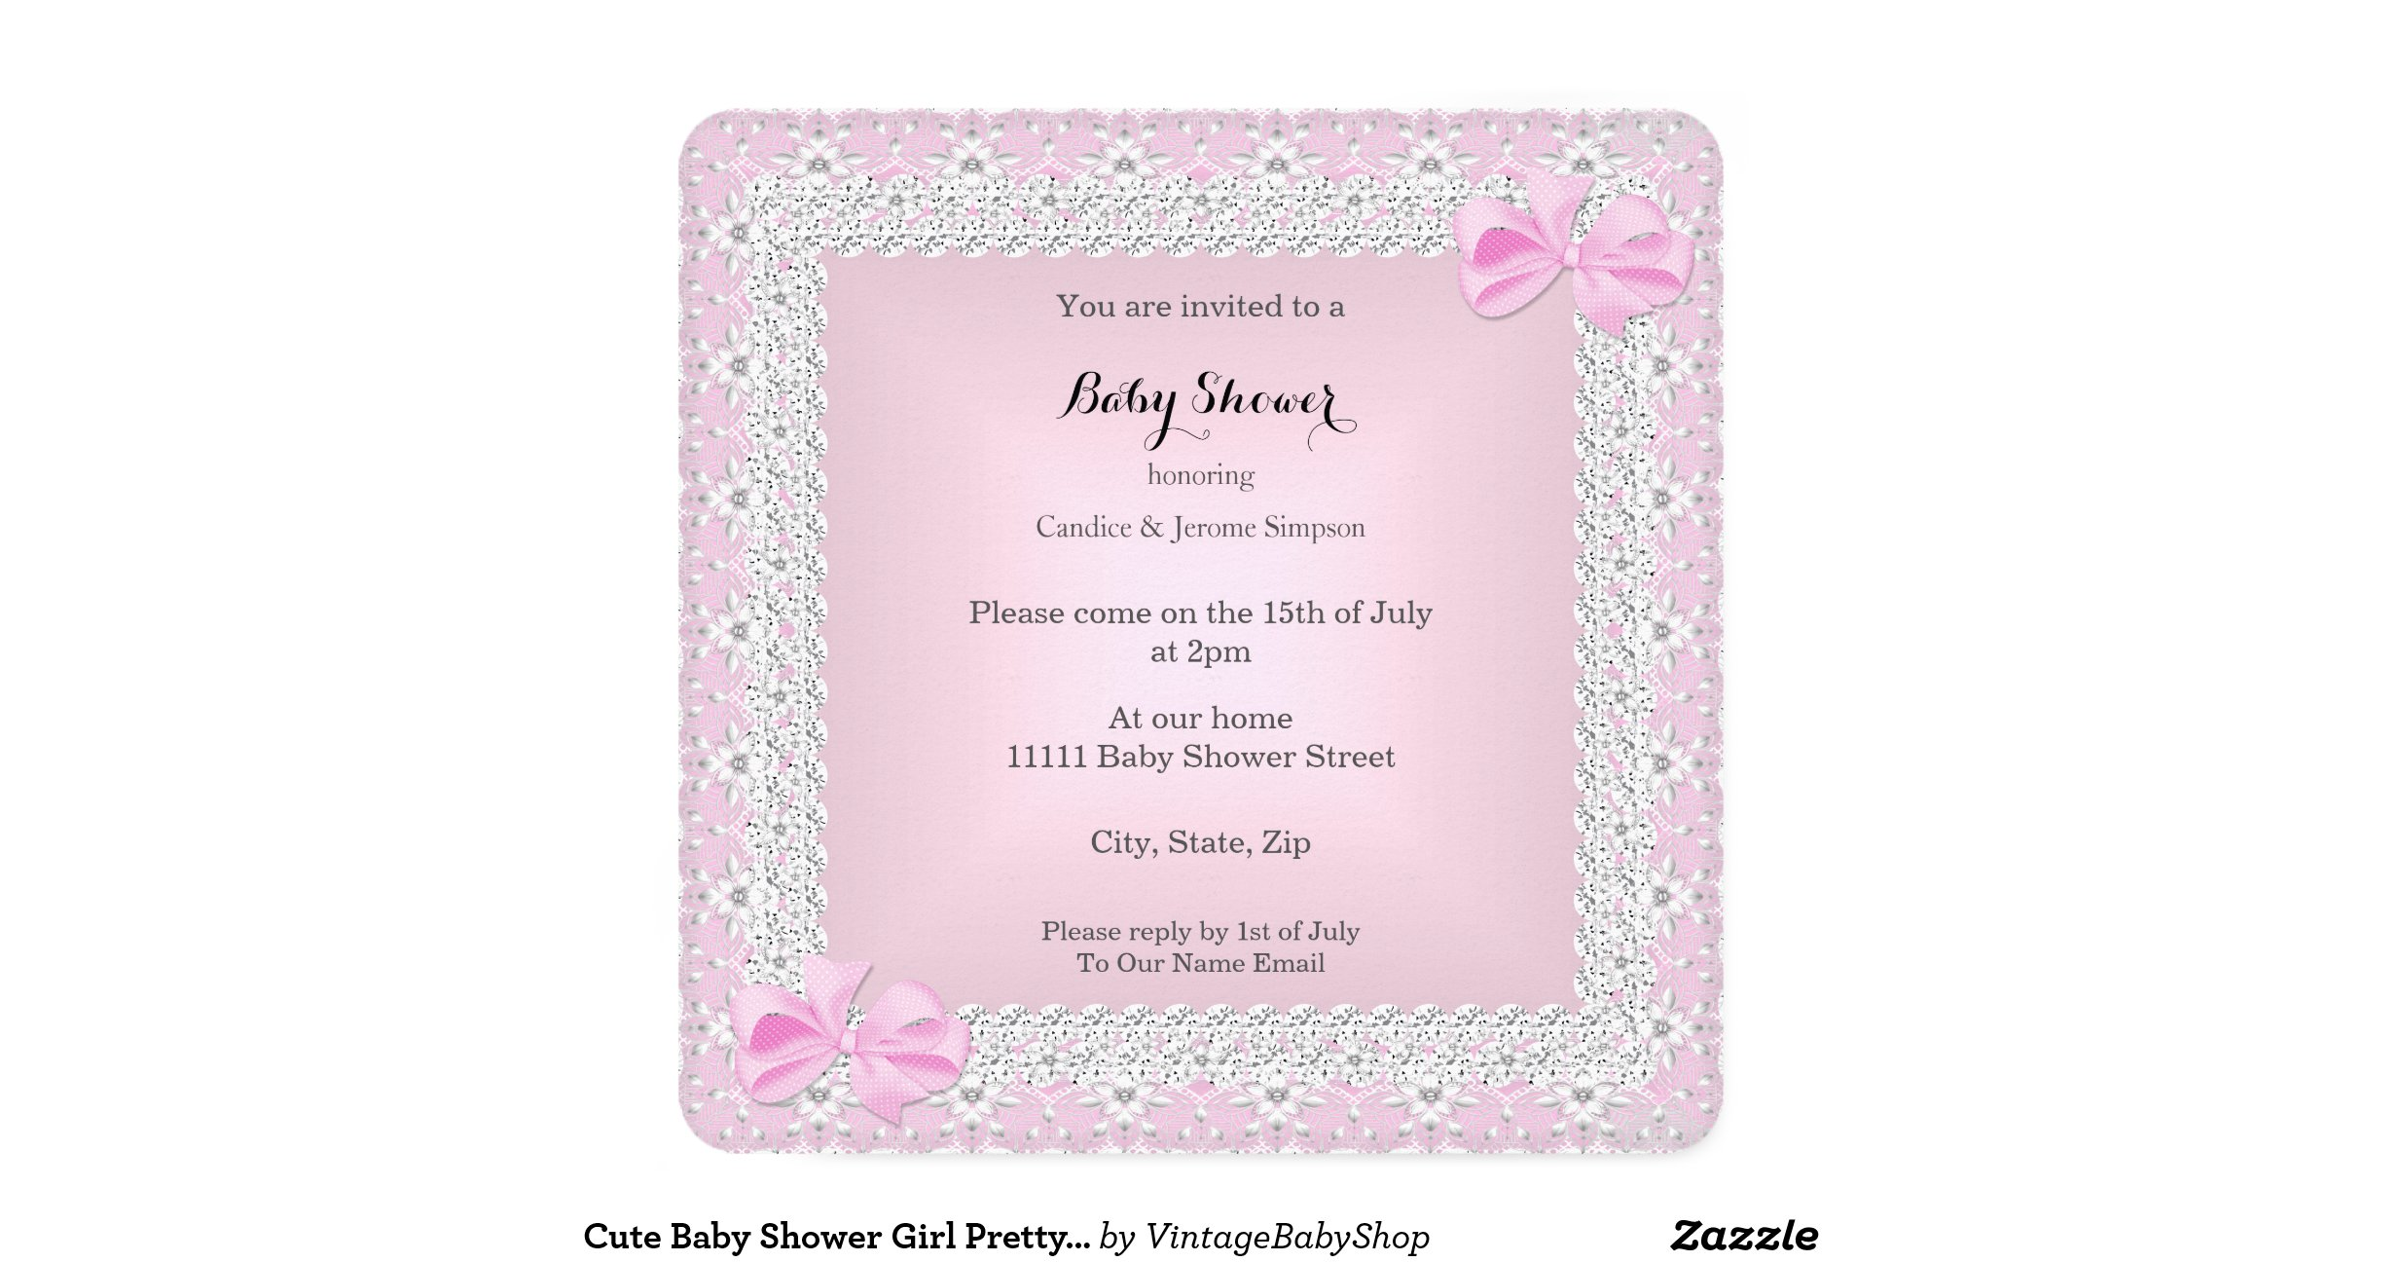 cute baby shower girl pretty pink tutu ethnic invitation